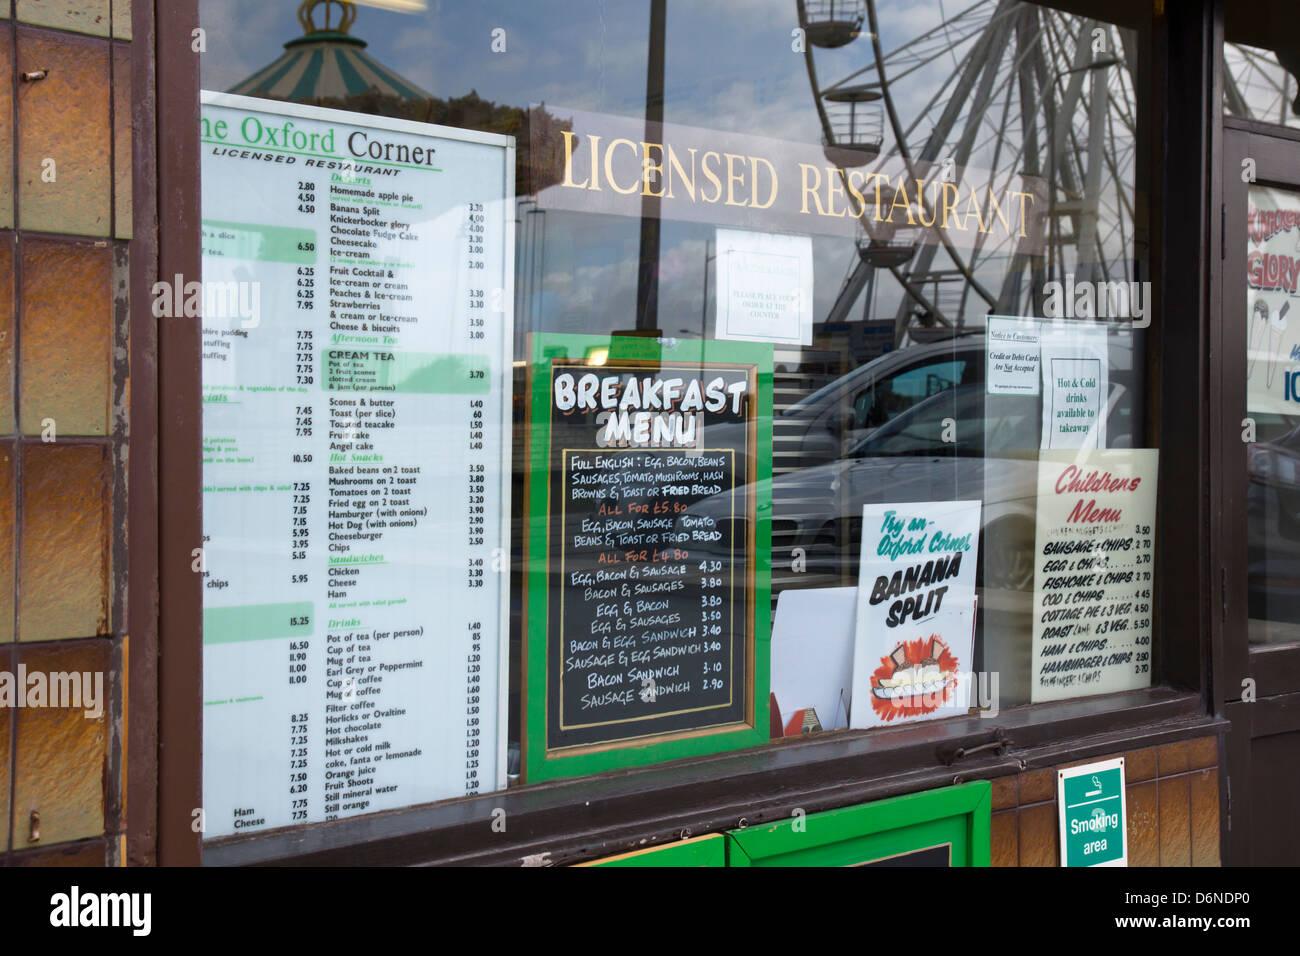 a-typical-cafe-menu-weston-super-mare-somerset-england-uk-D6NDP0.jpg